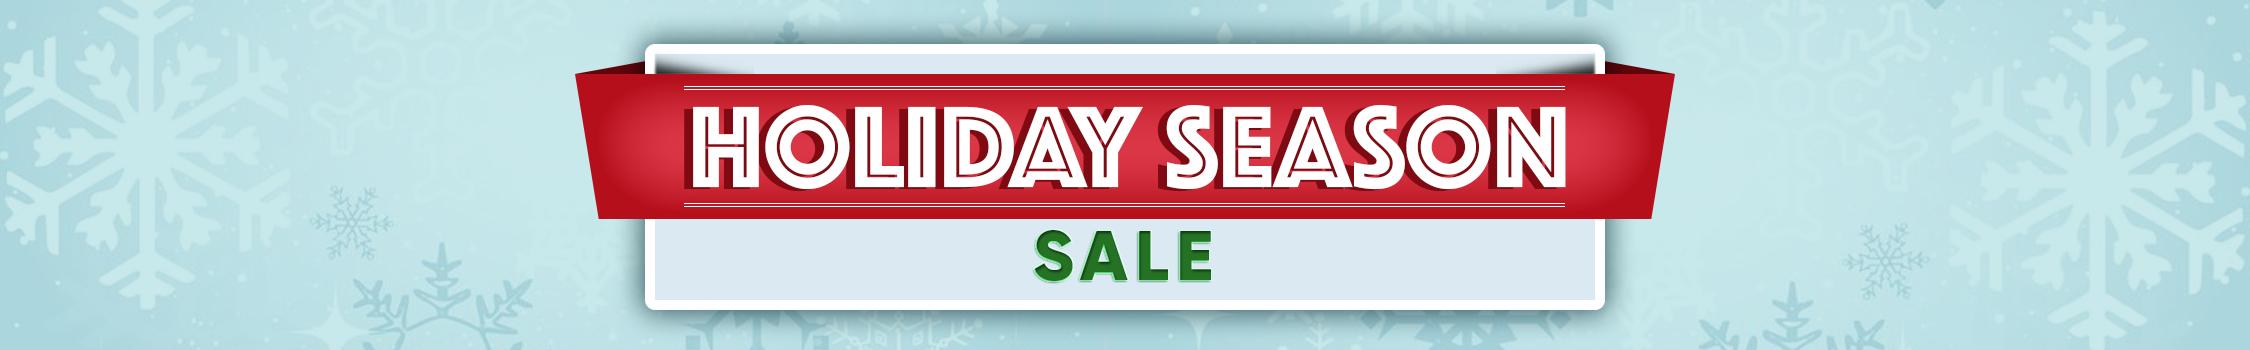 Holiday Season Sale